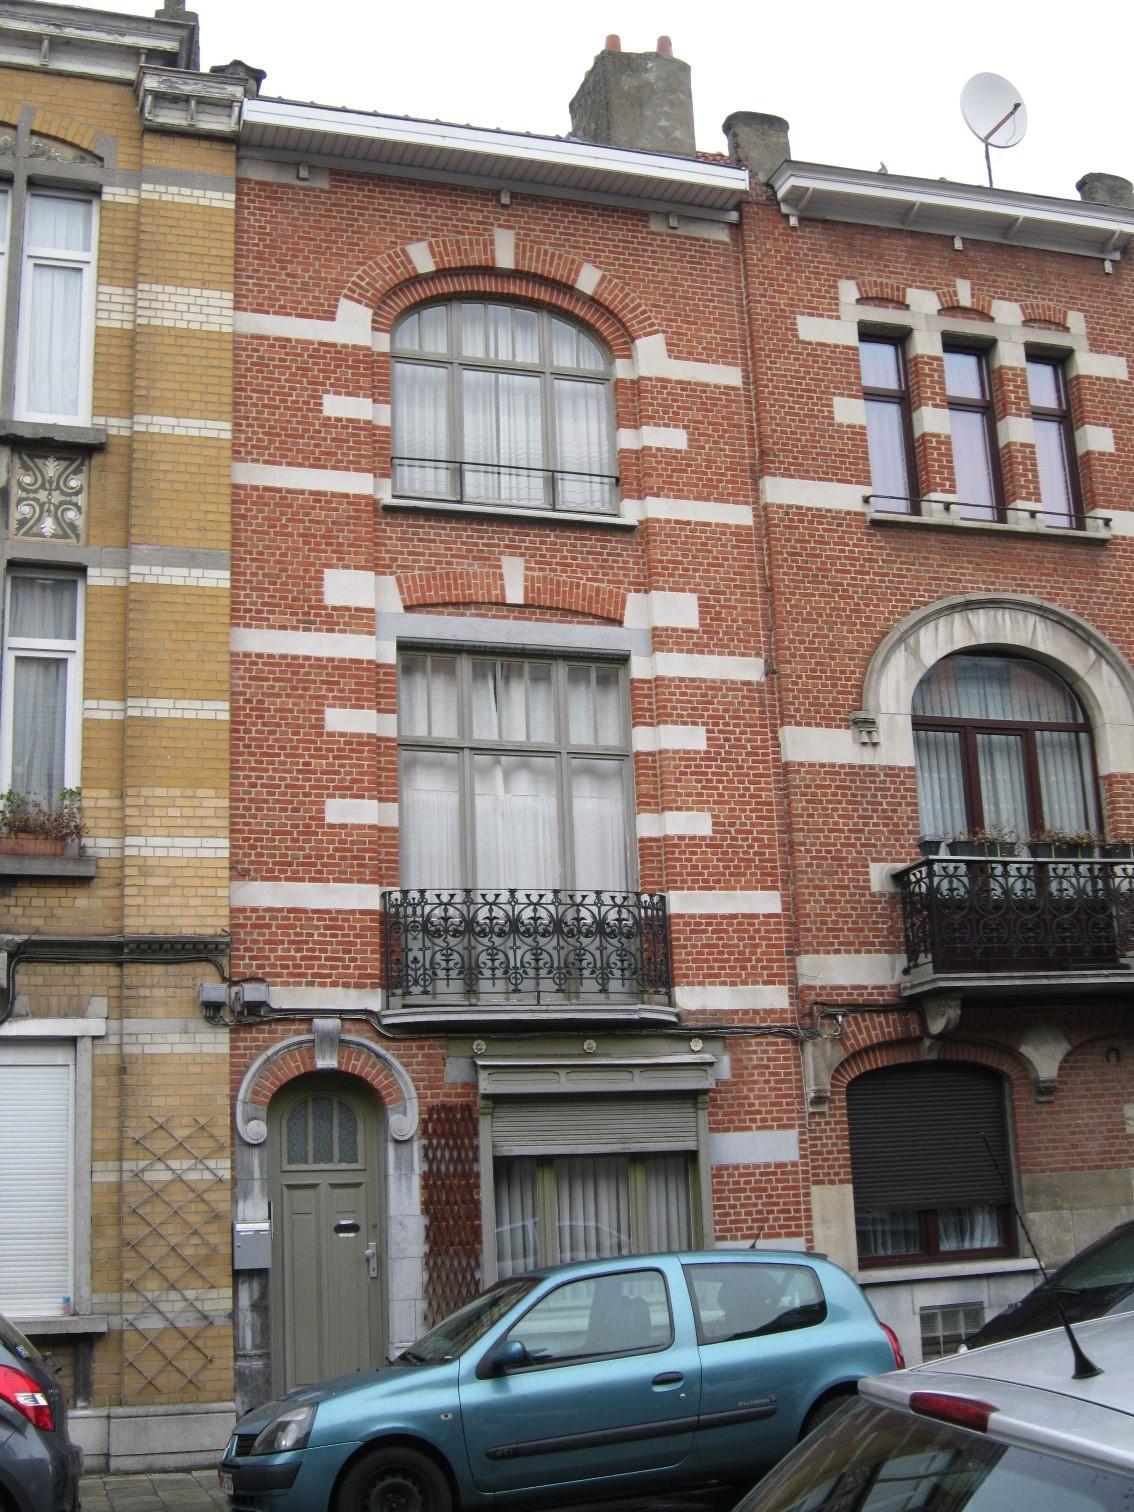 Dokter Elie Lambottestraat 36, 2015